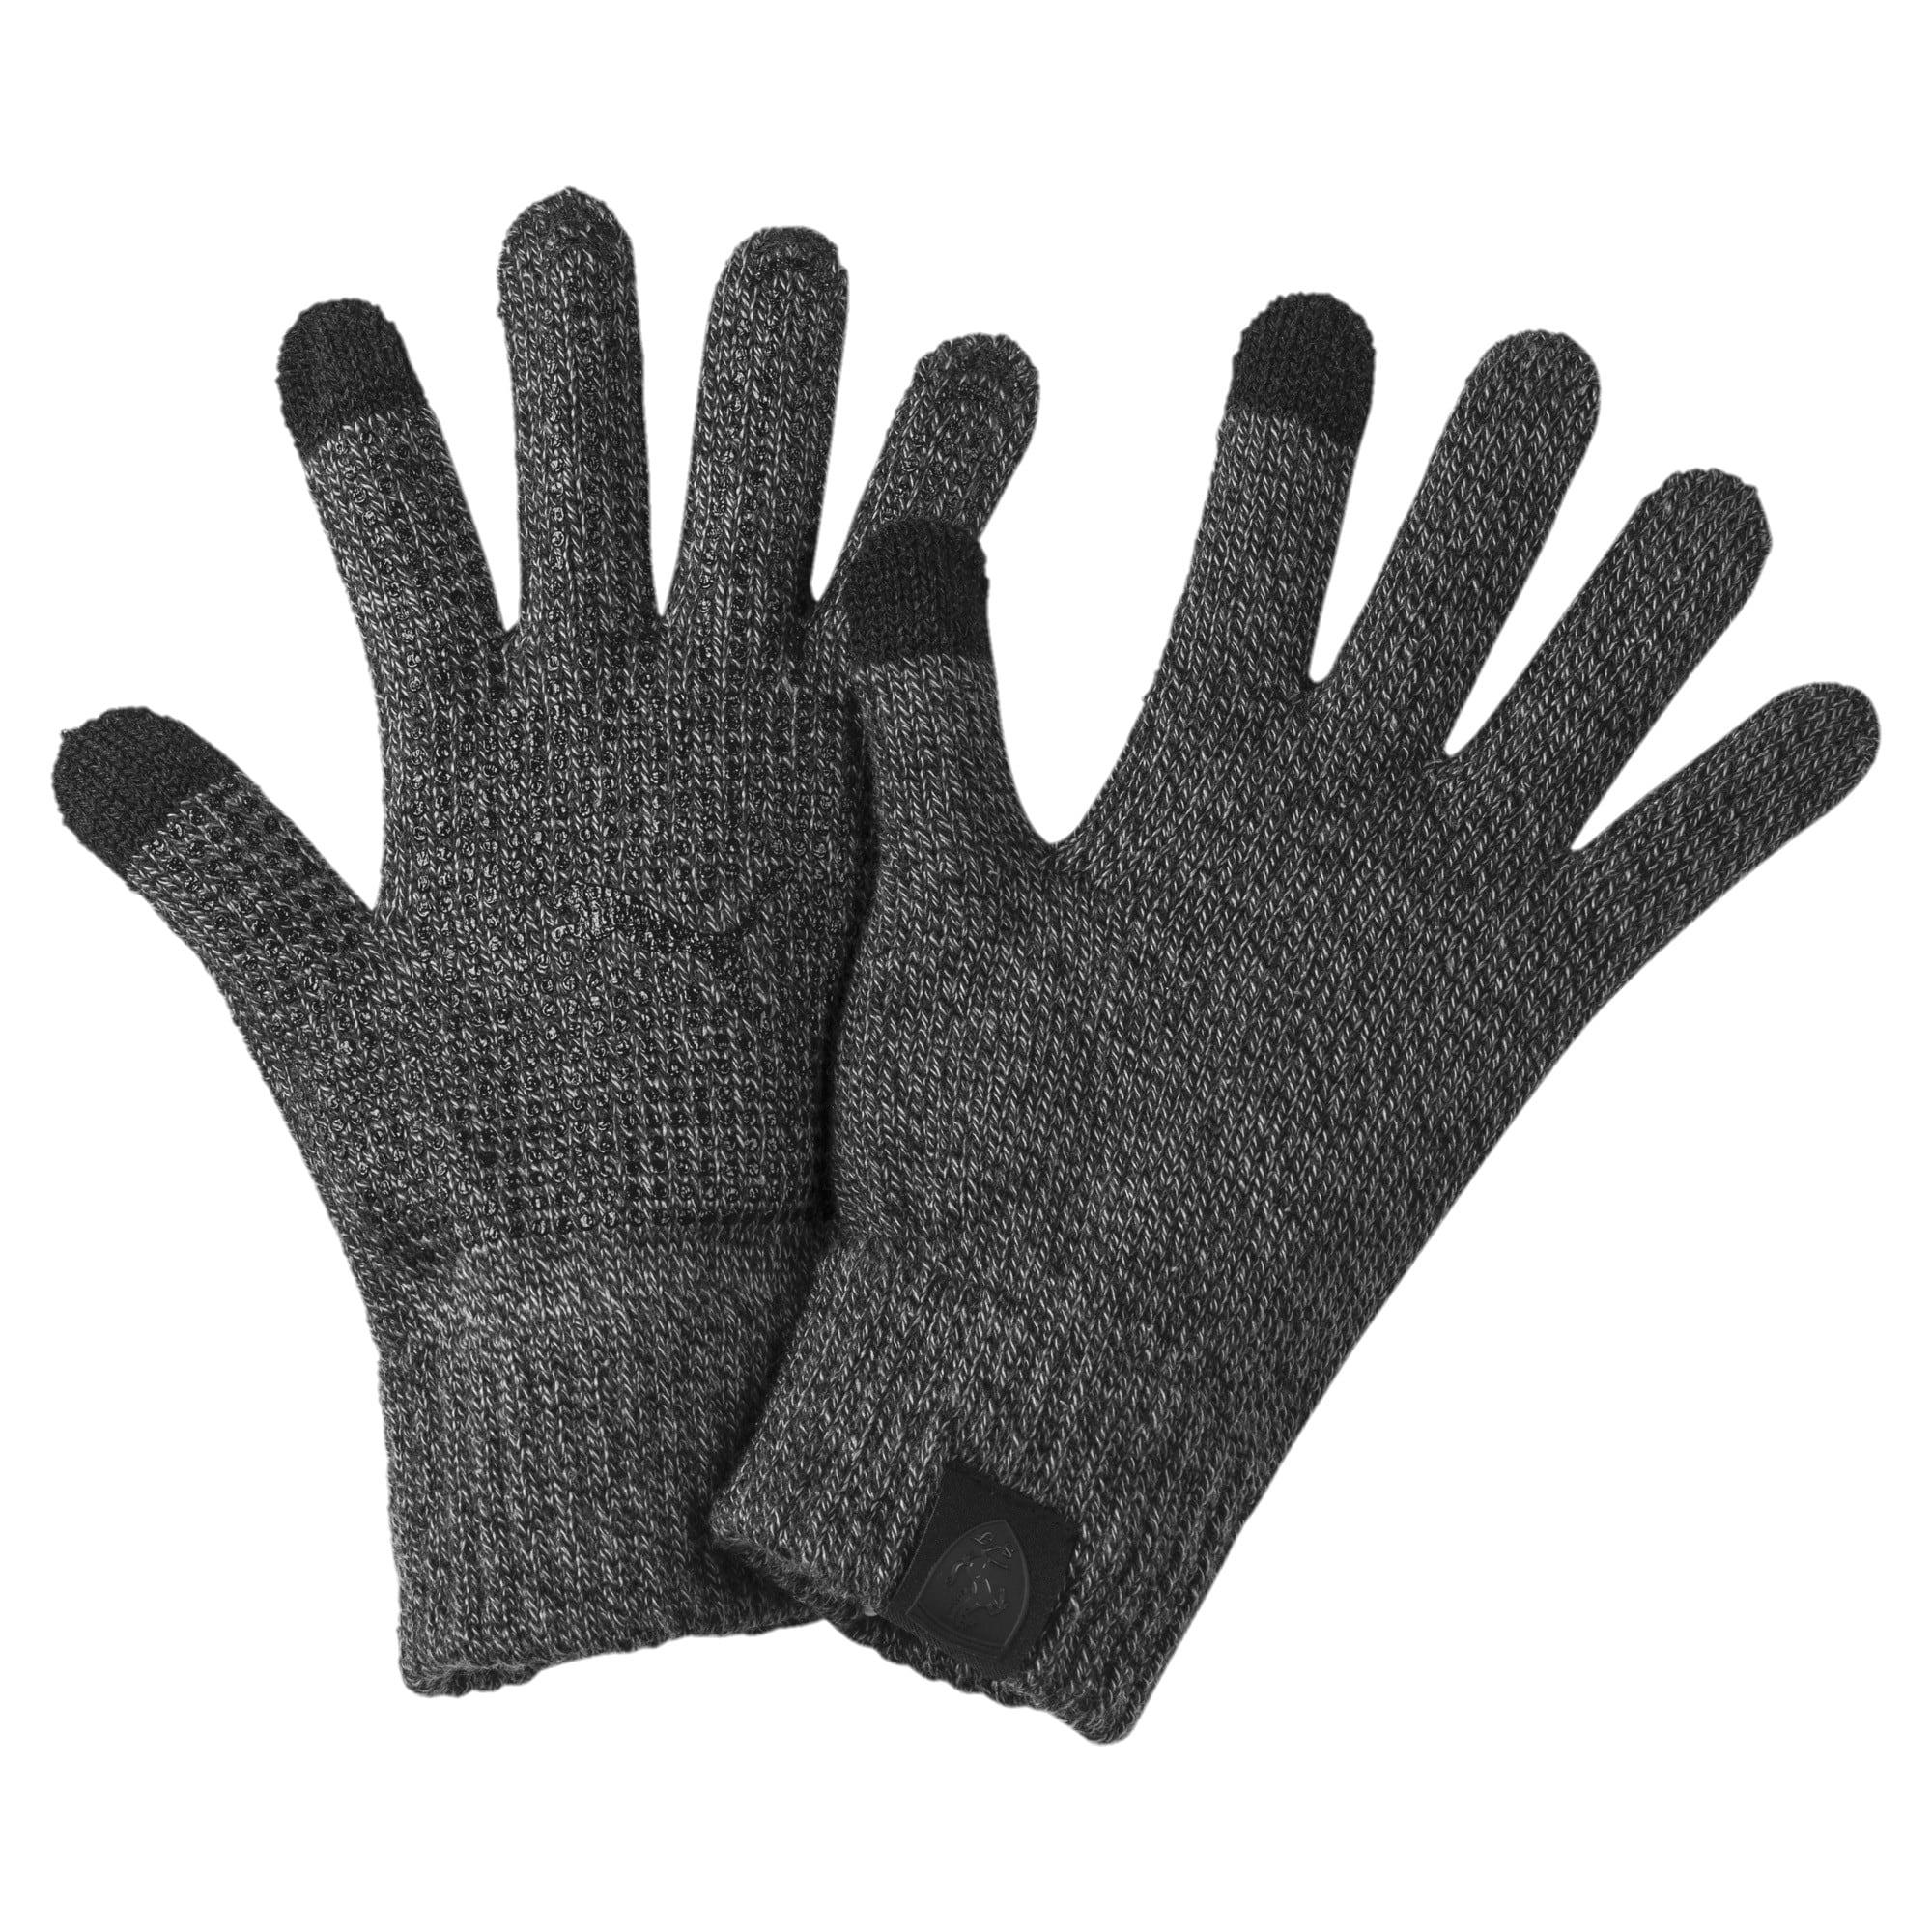 Thumbnail 1 of Ferrari Lifestyle Knit Gloves, Puma Black, medium-IND